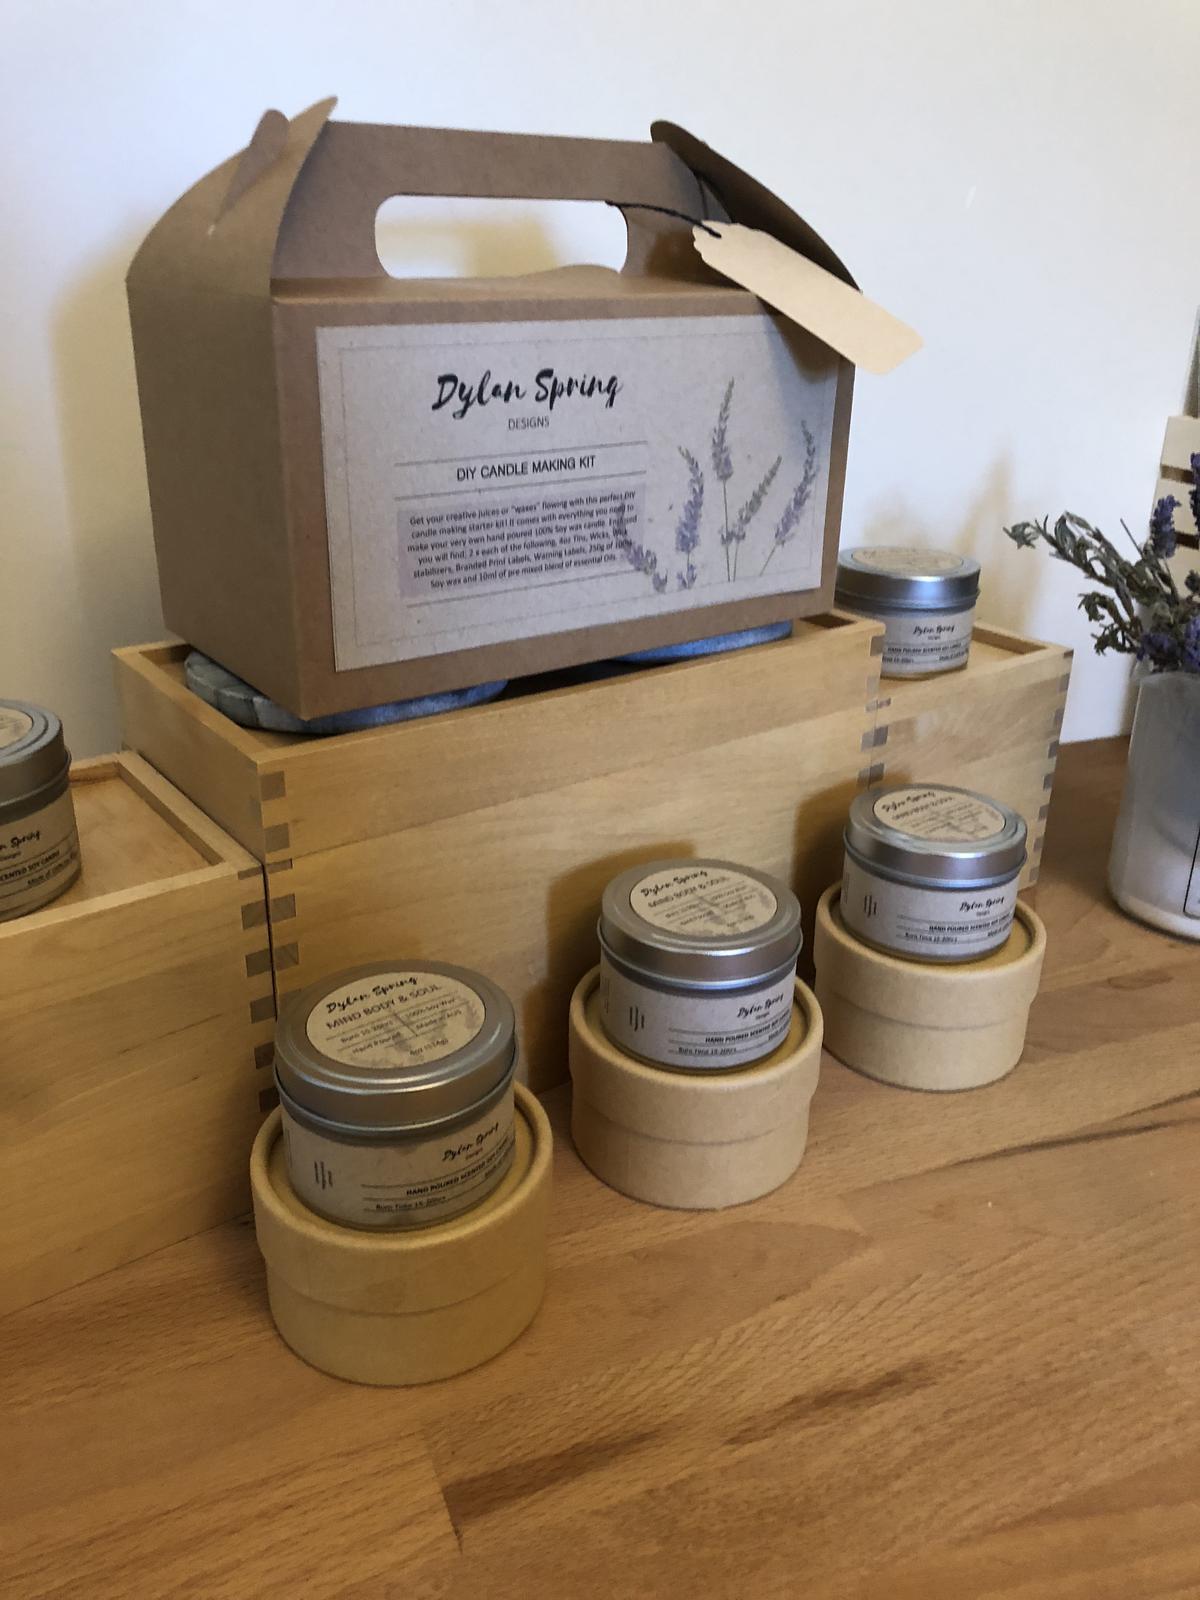 Stall Display - Trial Setup #3 - Candle Making Kits